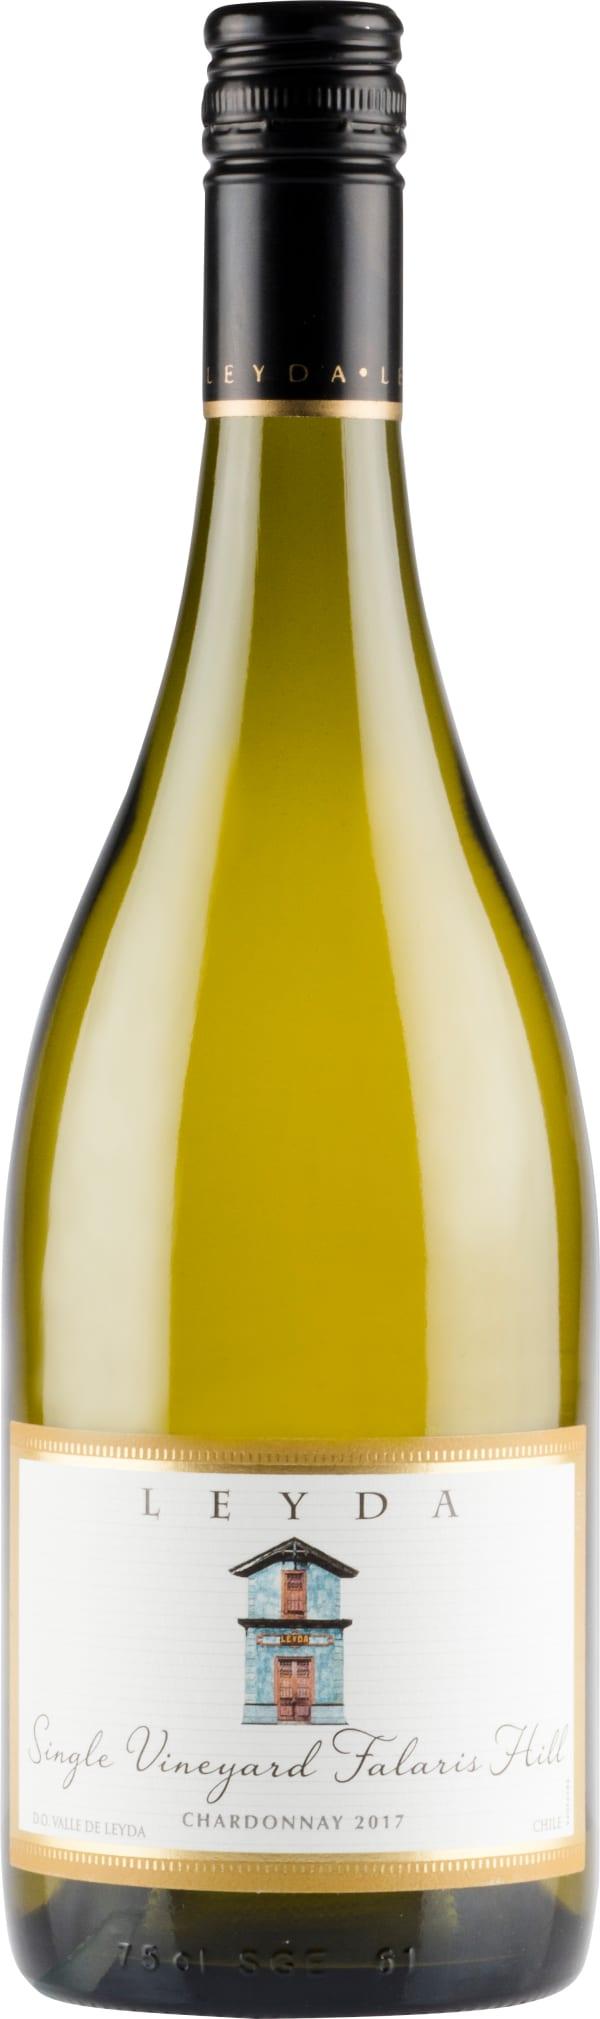 Leyda Single Vineyard Falaris Hill Chardonnay 2017